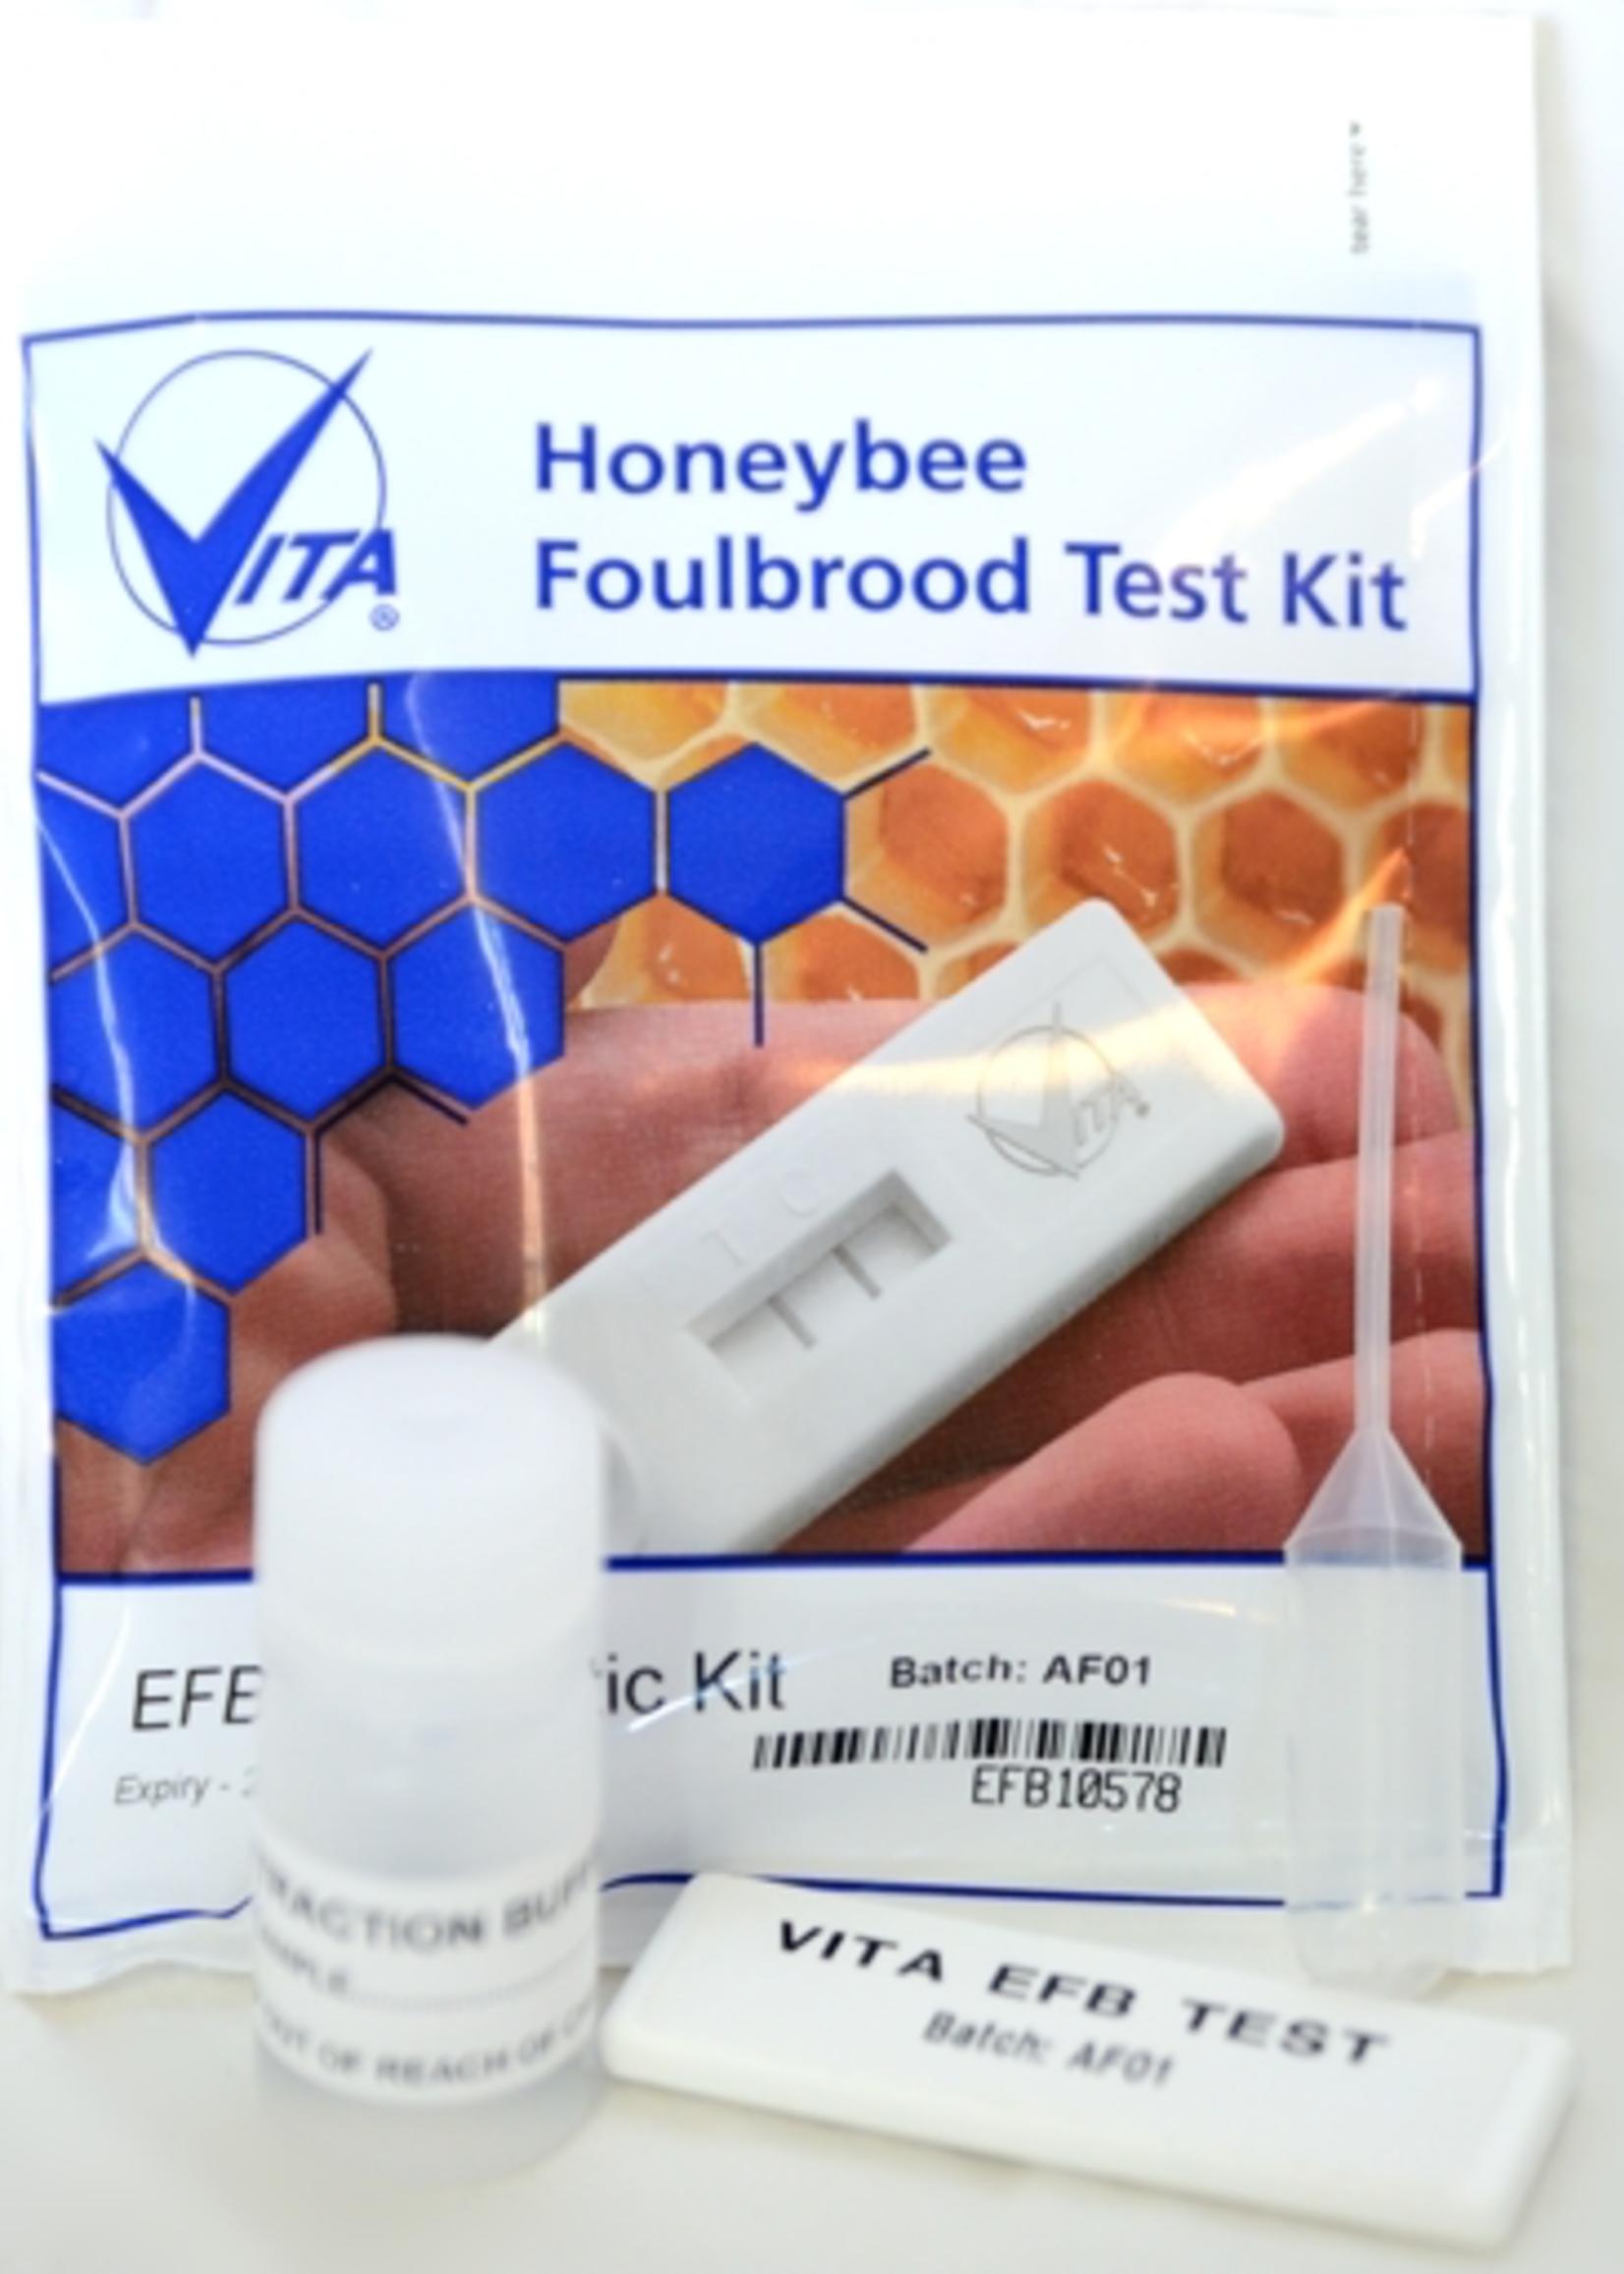 Vita EFB Test Kit